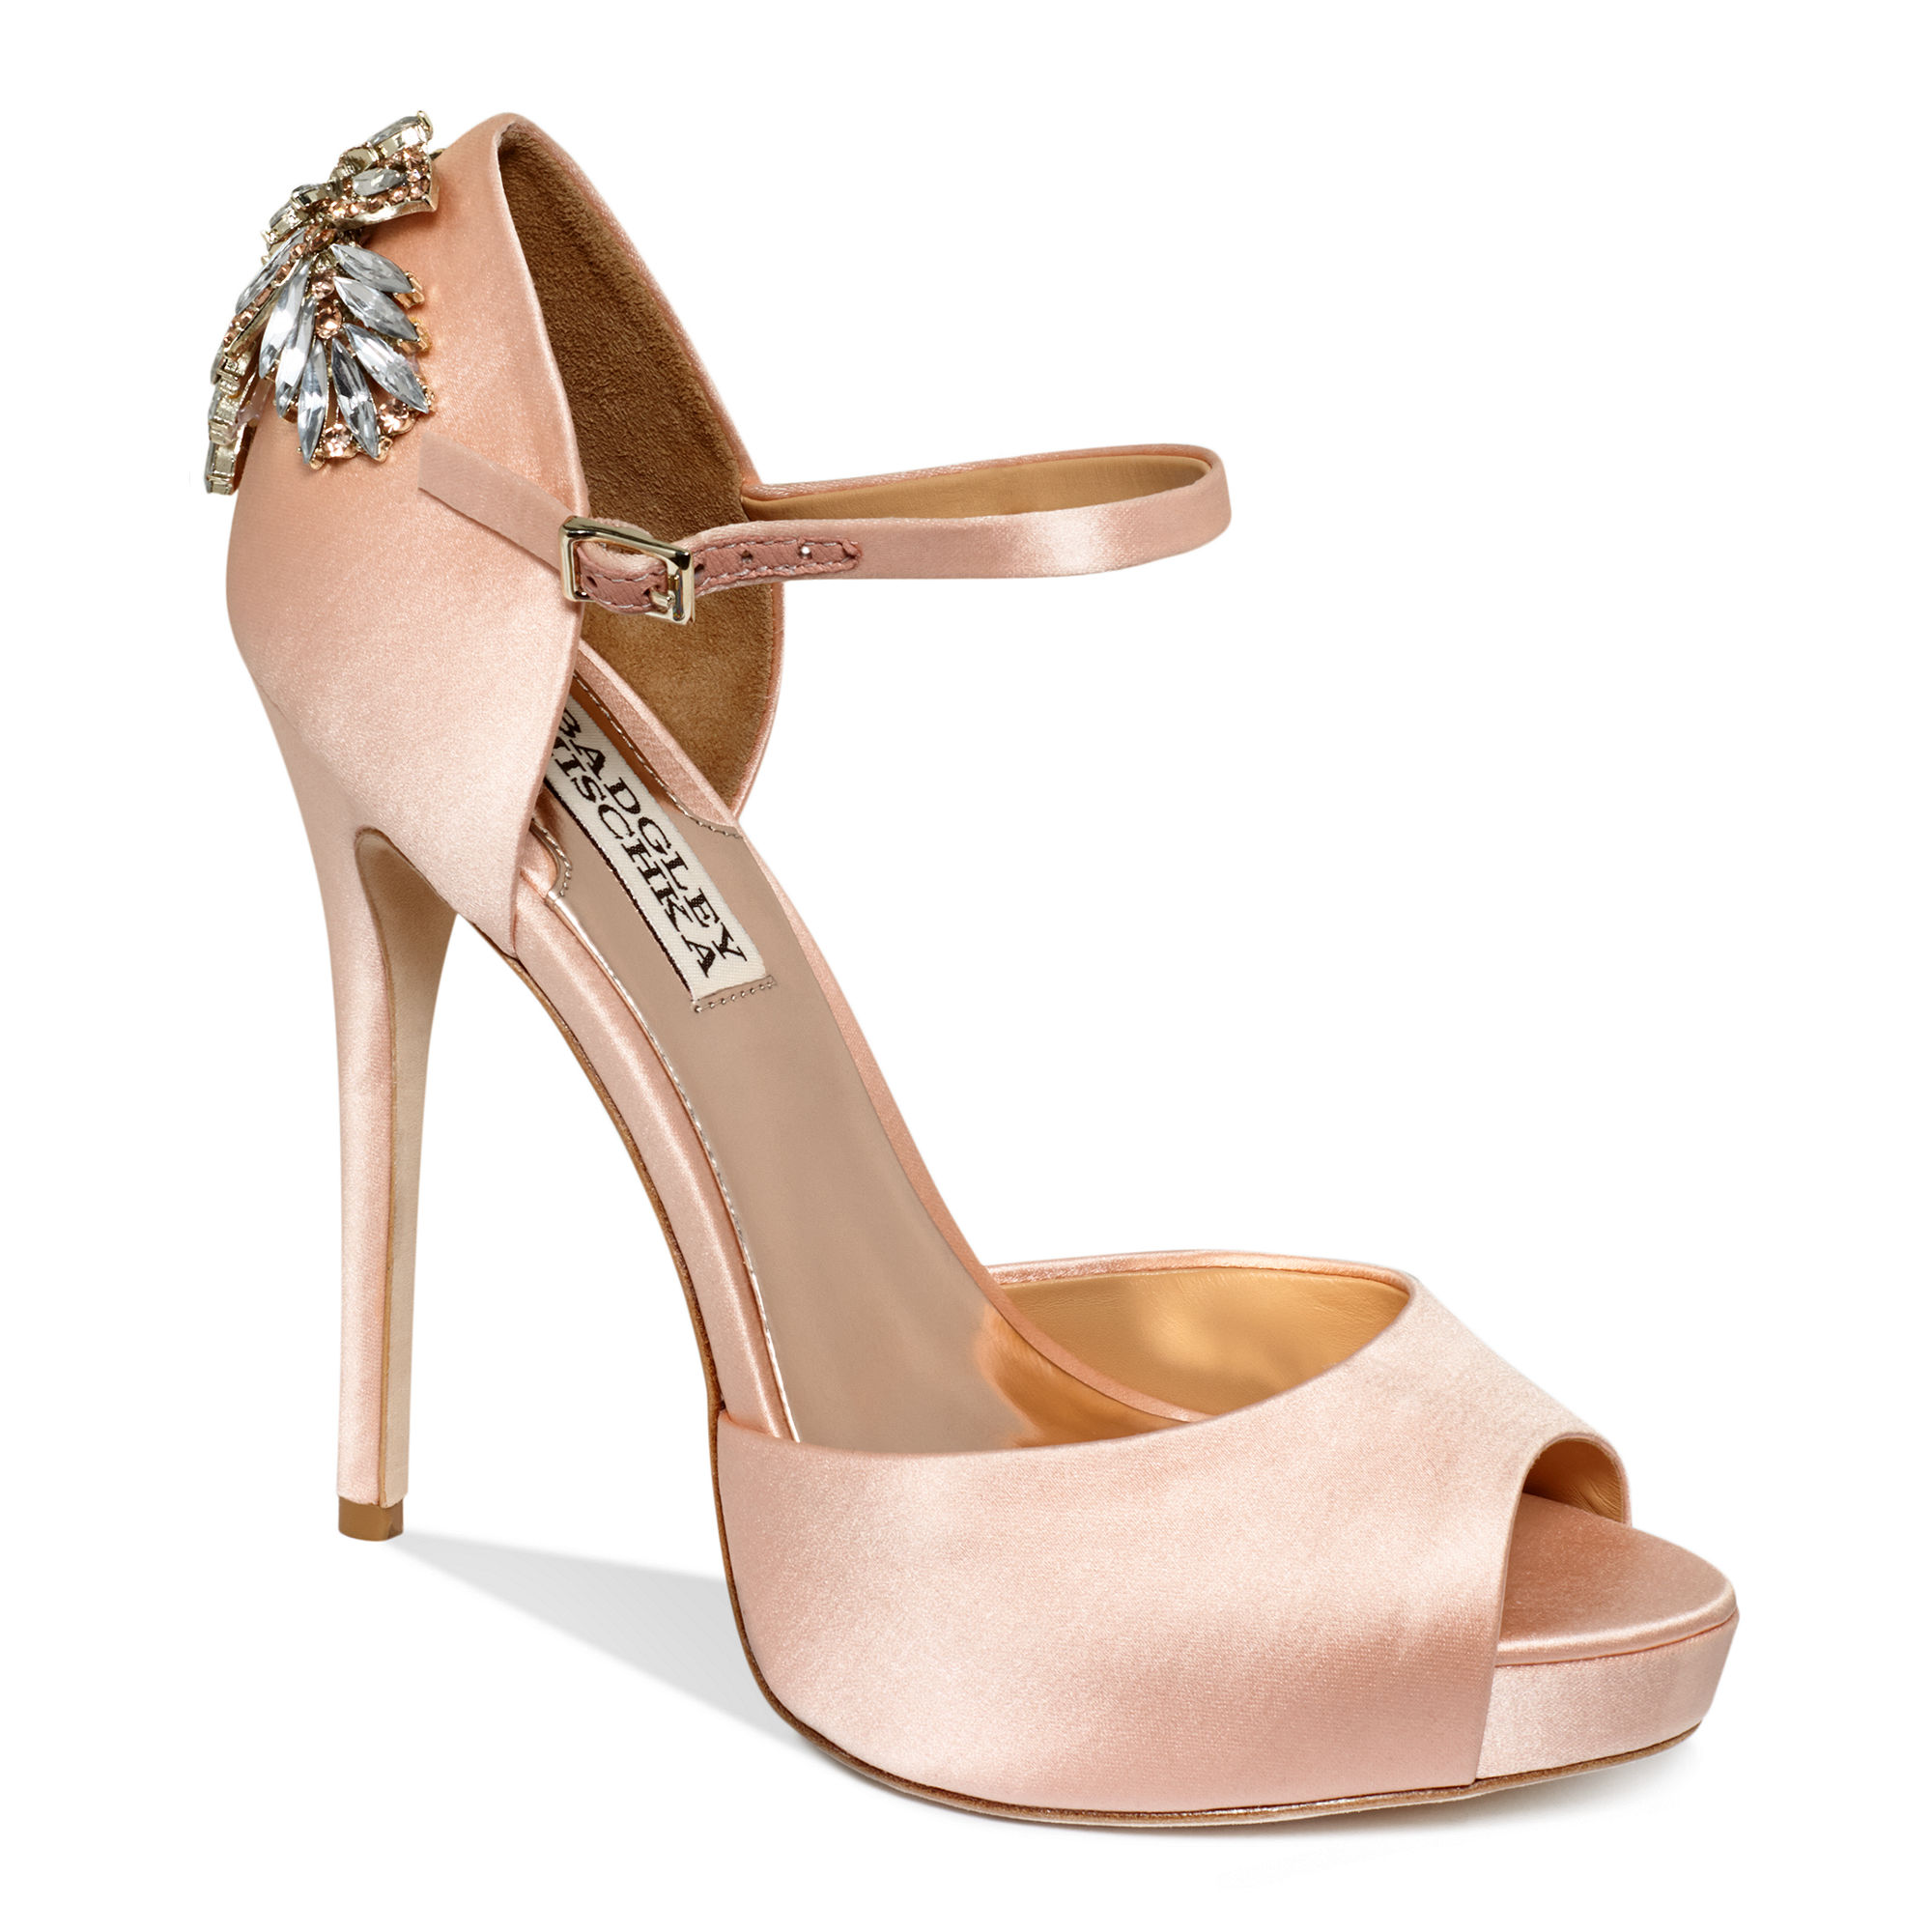 Badgley Mischka Red Bridal Shoes